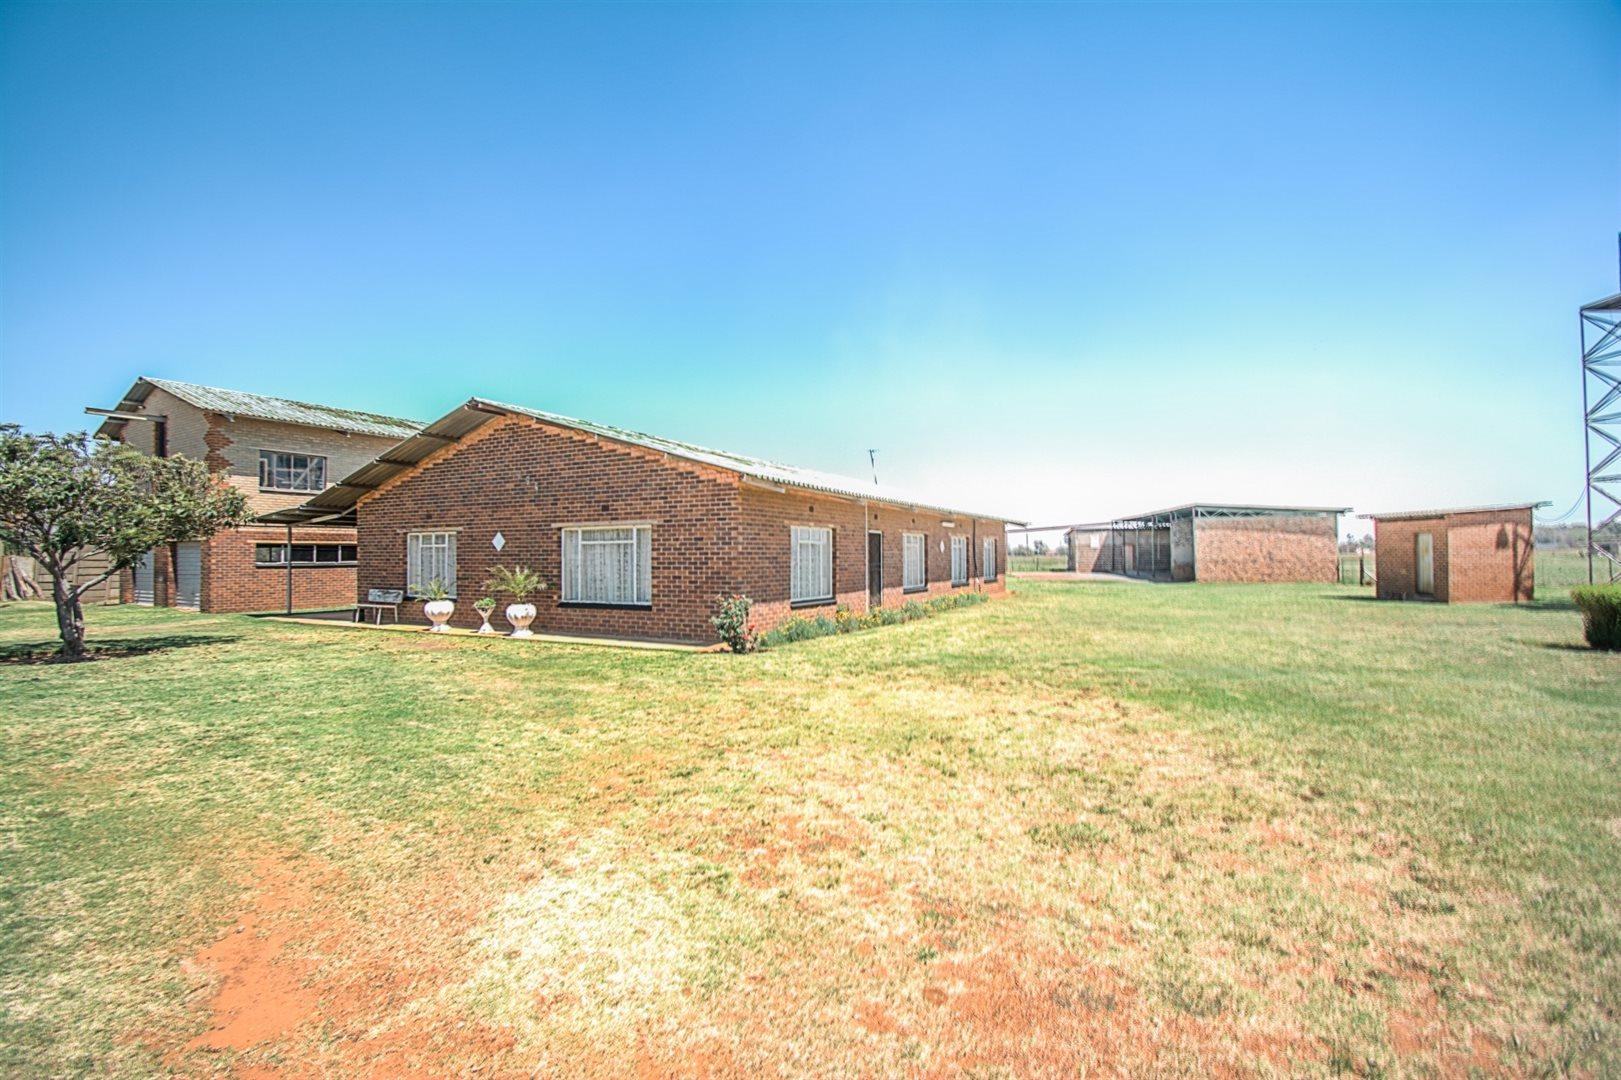 Meyerton, Mooilande Property  | Houses For Sale Mooilande, Mooilande, Farms 4 bedrooms property for sale Price:1,610,000